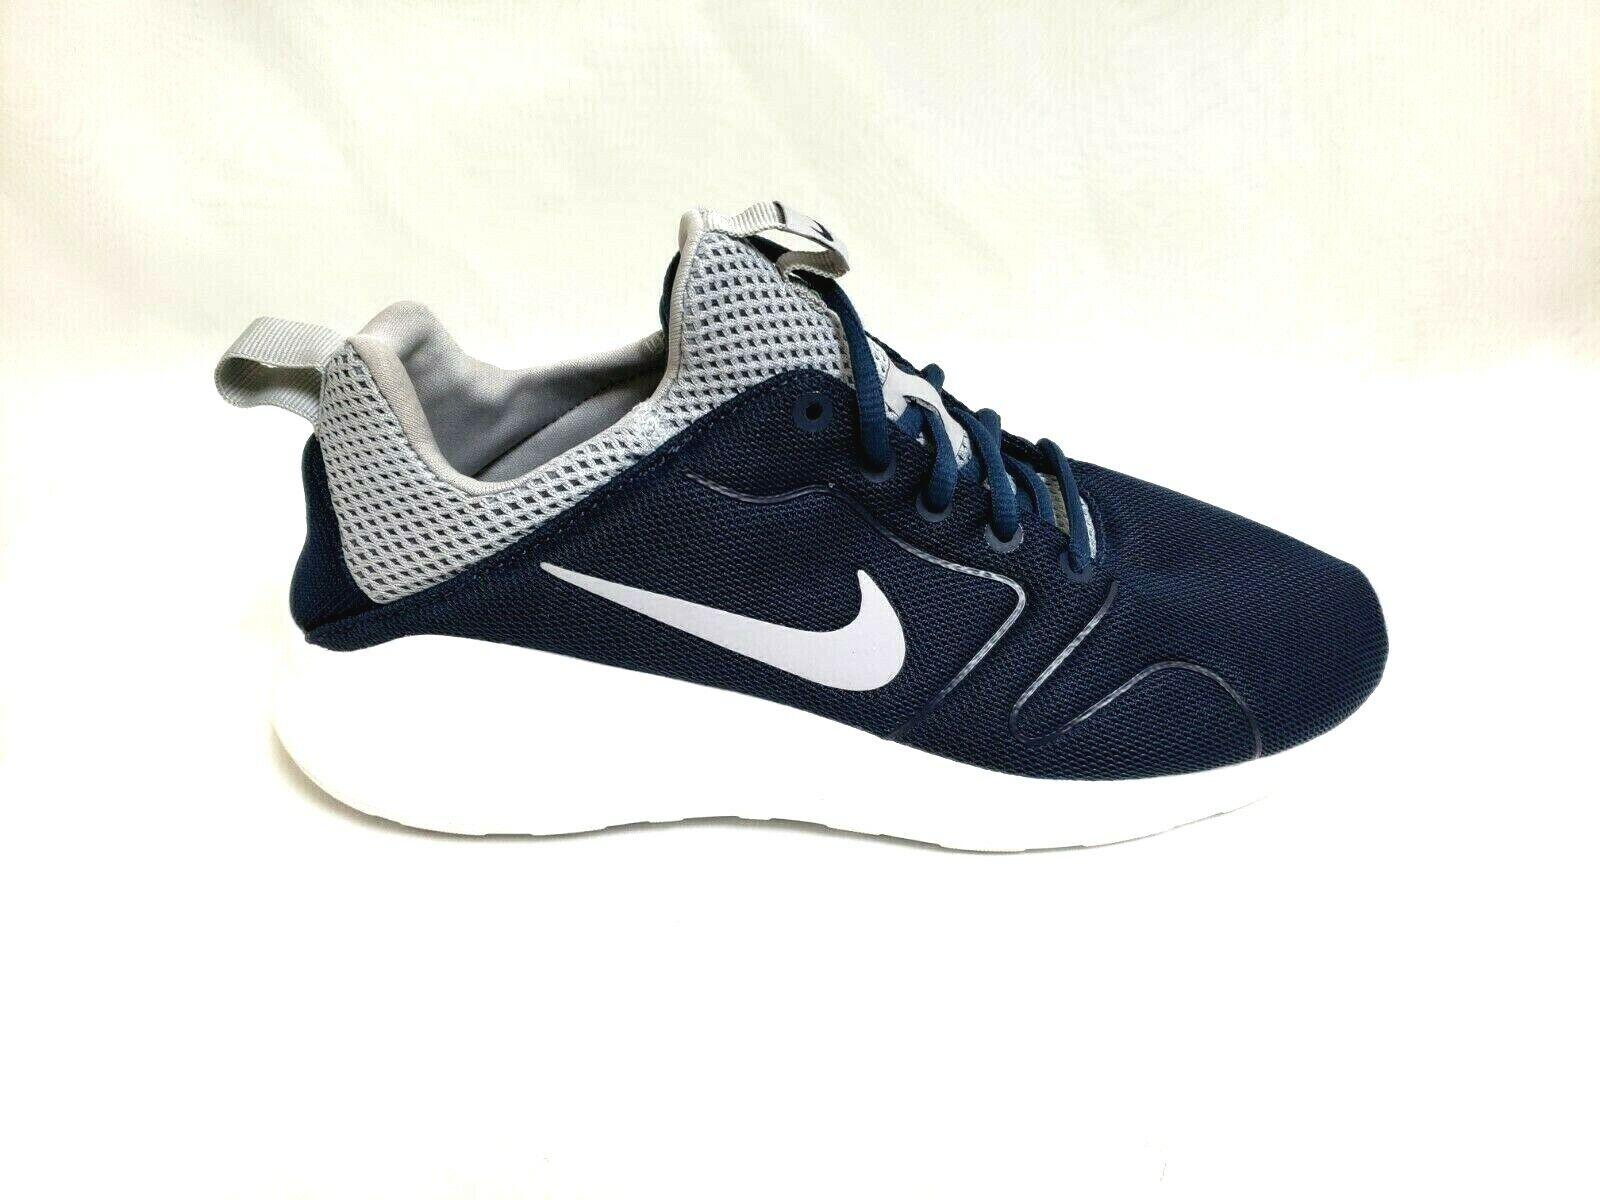 359a368fb NEW Men s NIKE Kaishi 2.0 shoes 833411-401 – Navy Grey White 80N sm ...